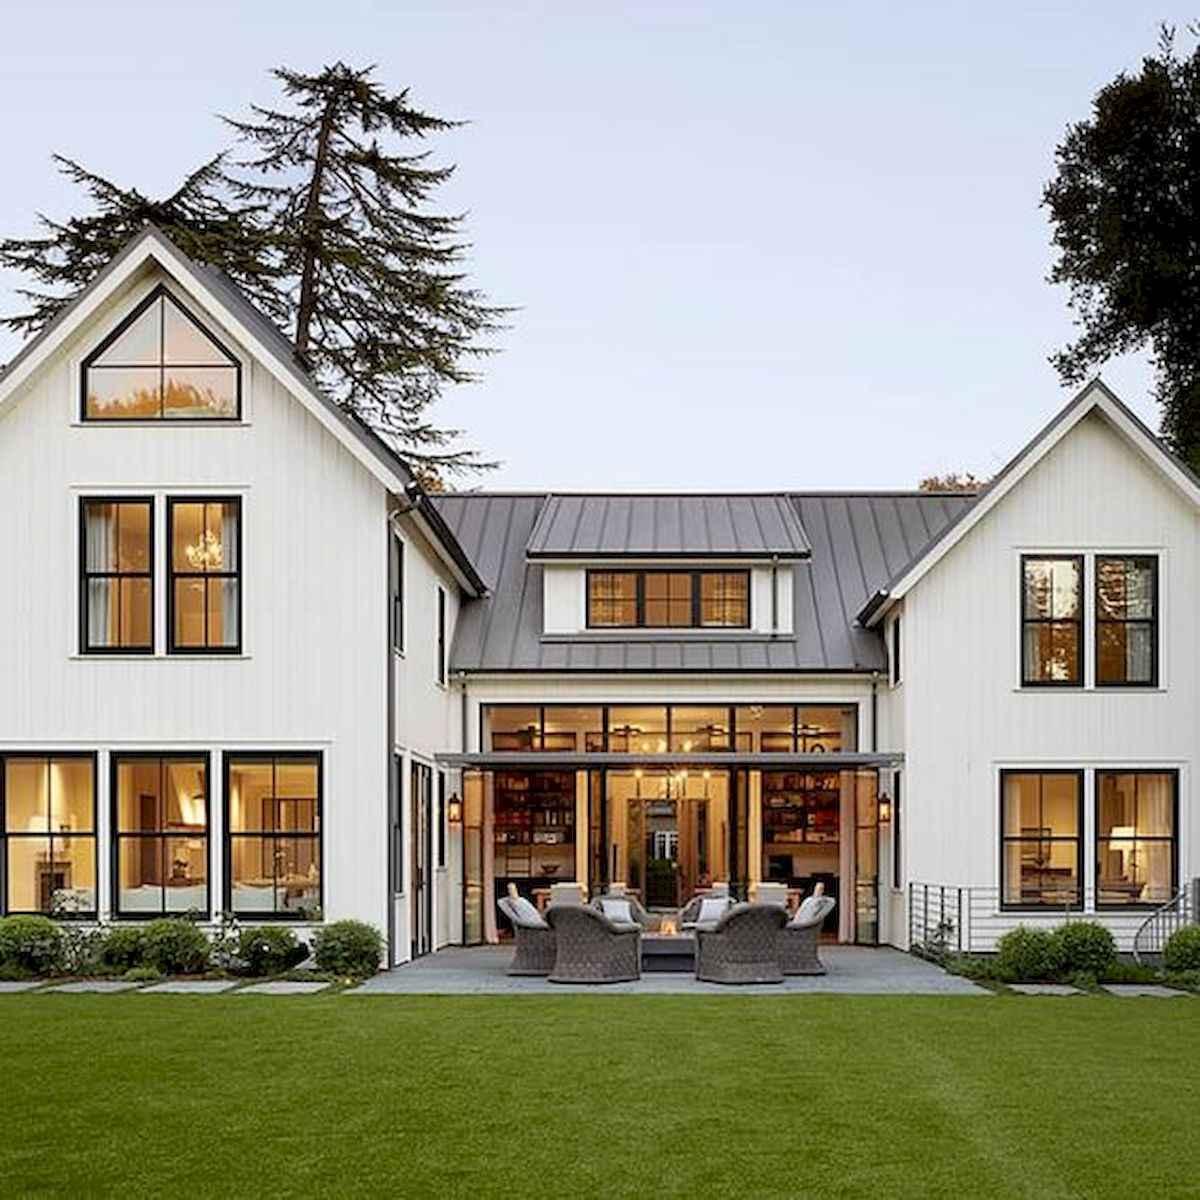 33 Best Modern Farmhouse Exterior Design Ideas (32)